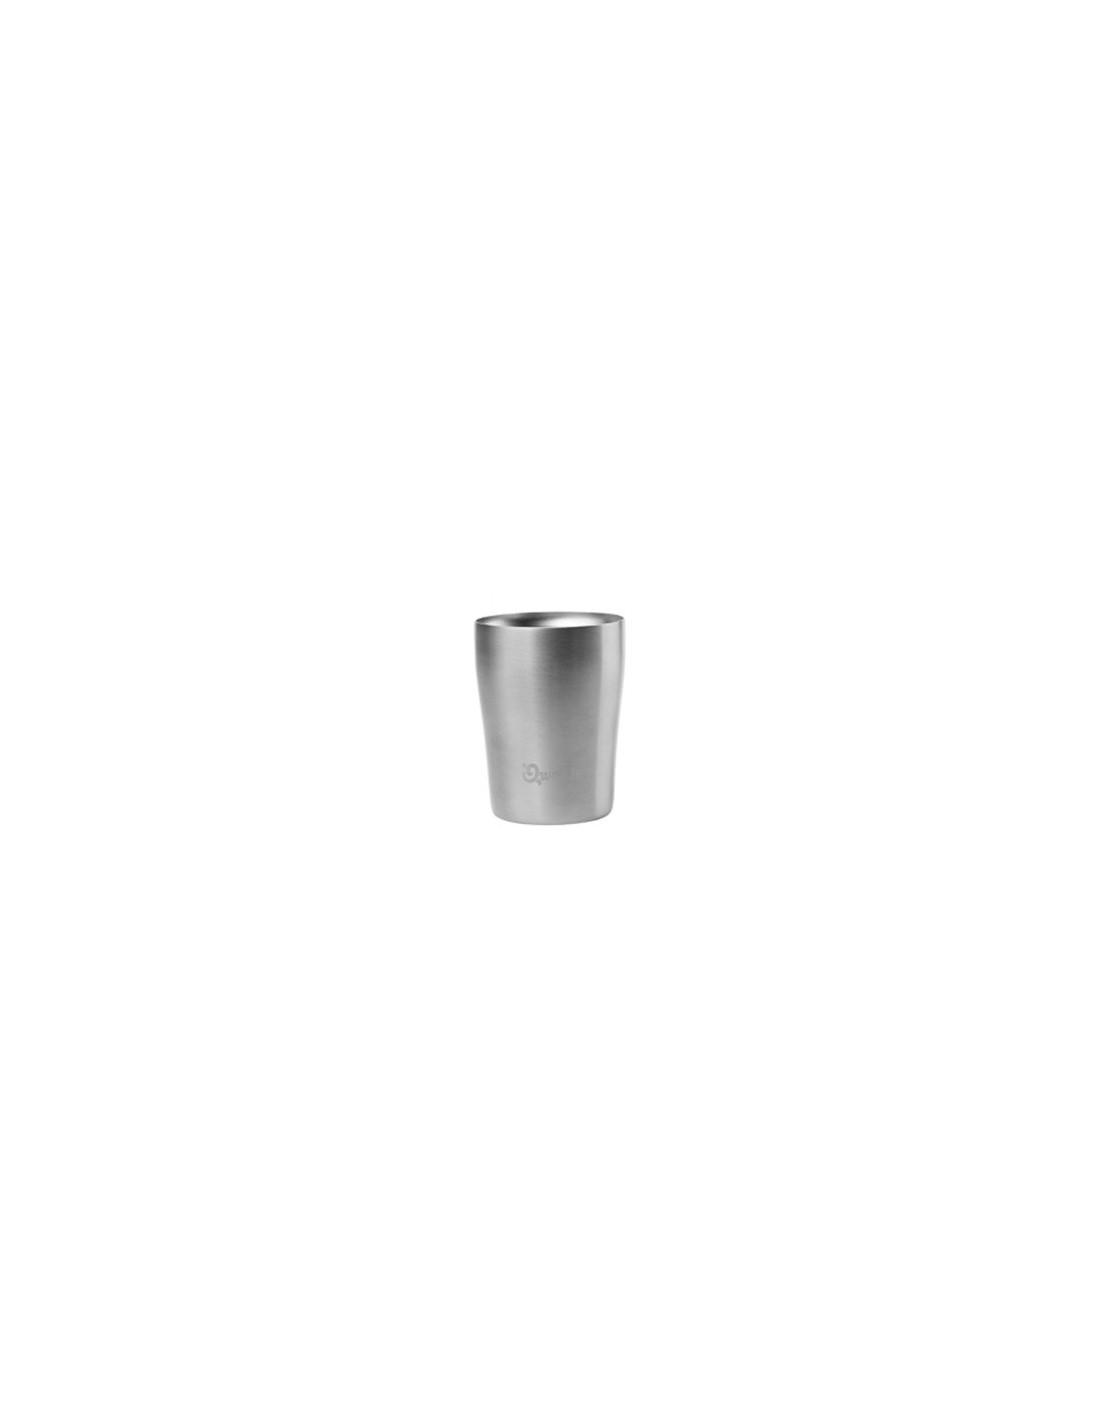 02311e4d2f Verre gobelet inox isotherme QWETCH - MES TENDANCES BIO. Loading zoom